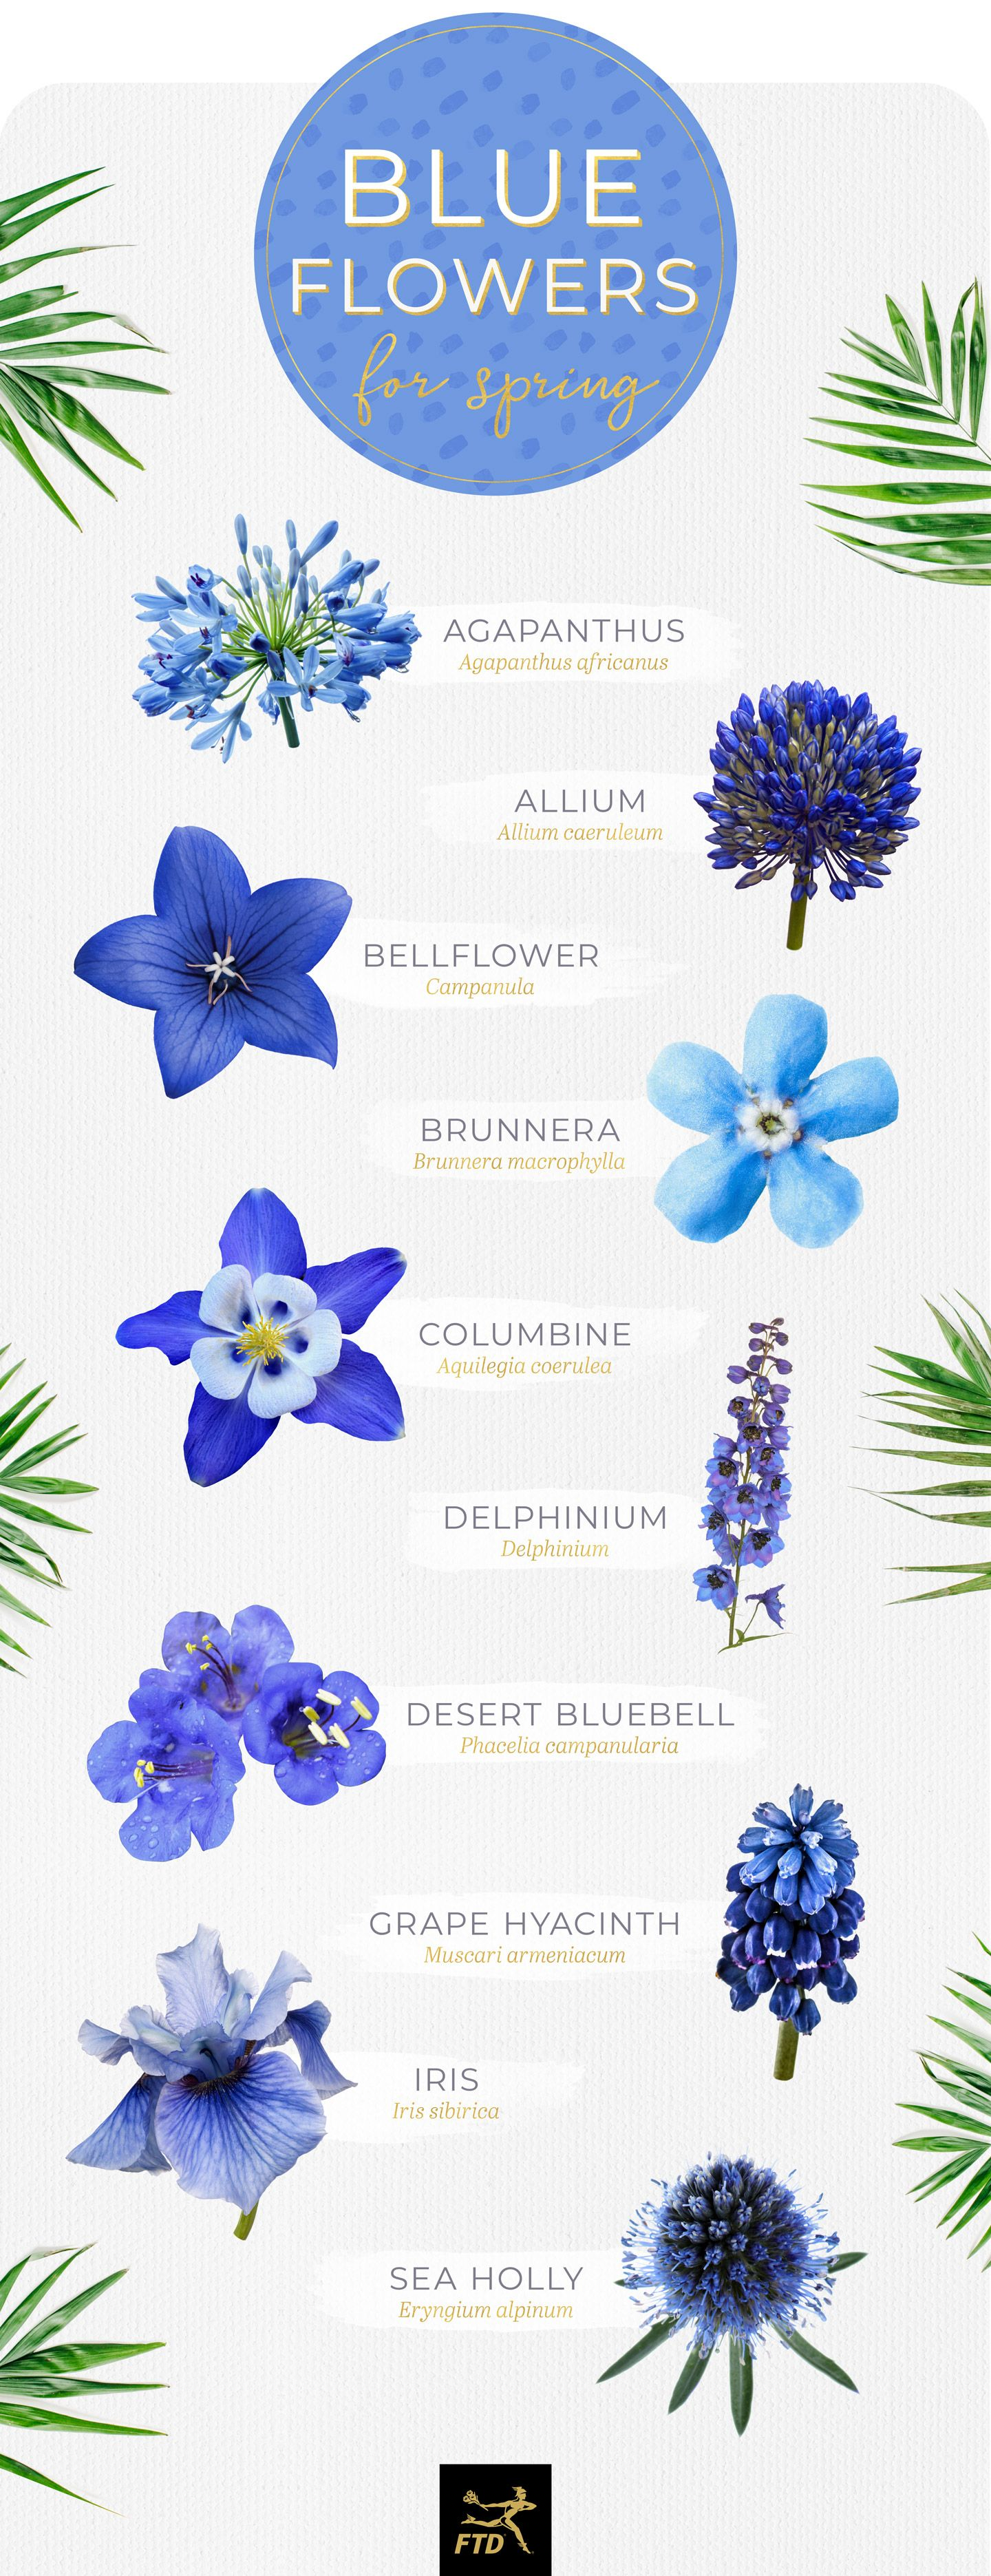 30 Types of Blue Flowers Types of blue flowers, Blue